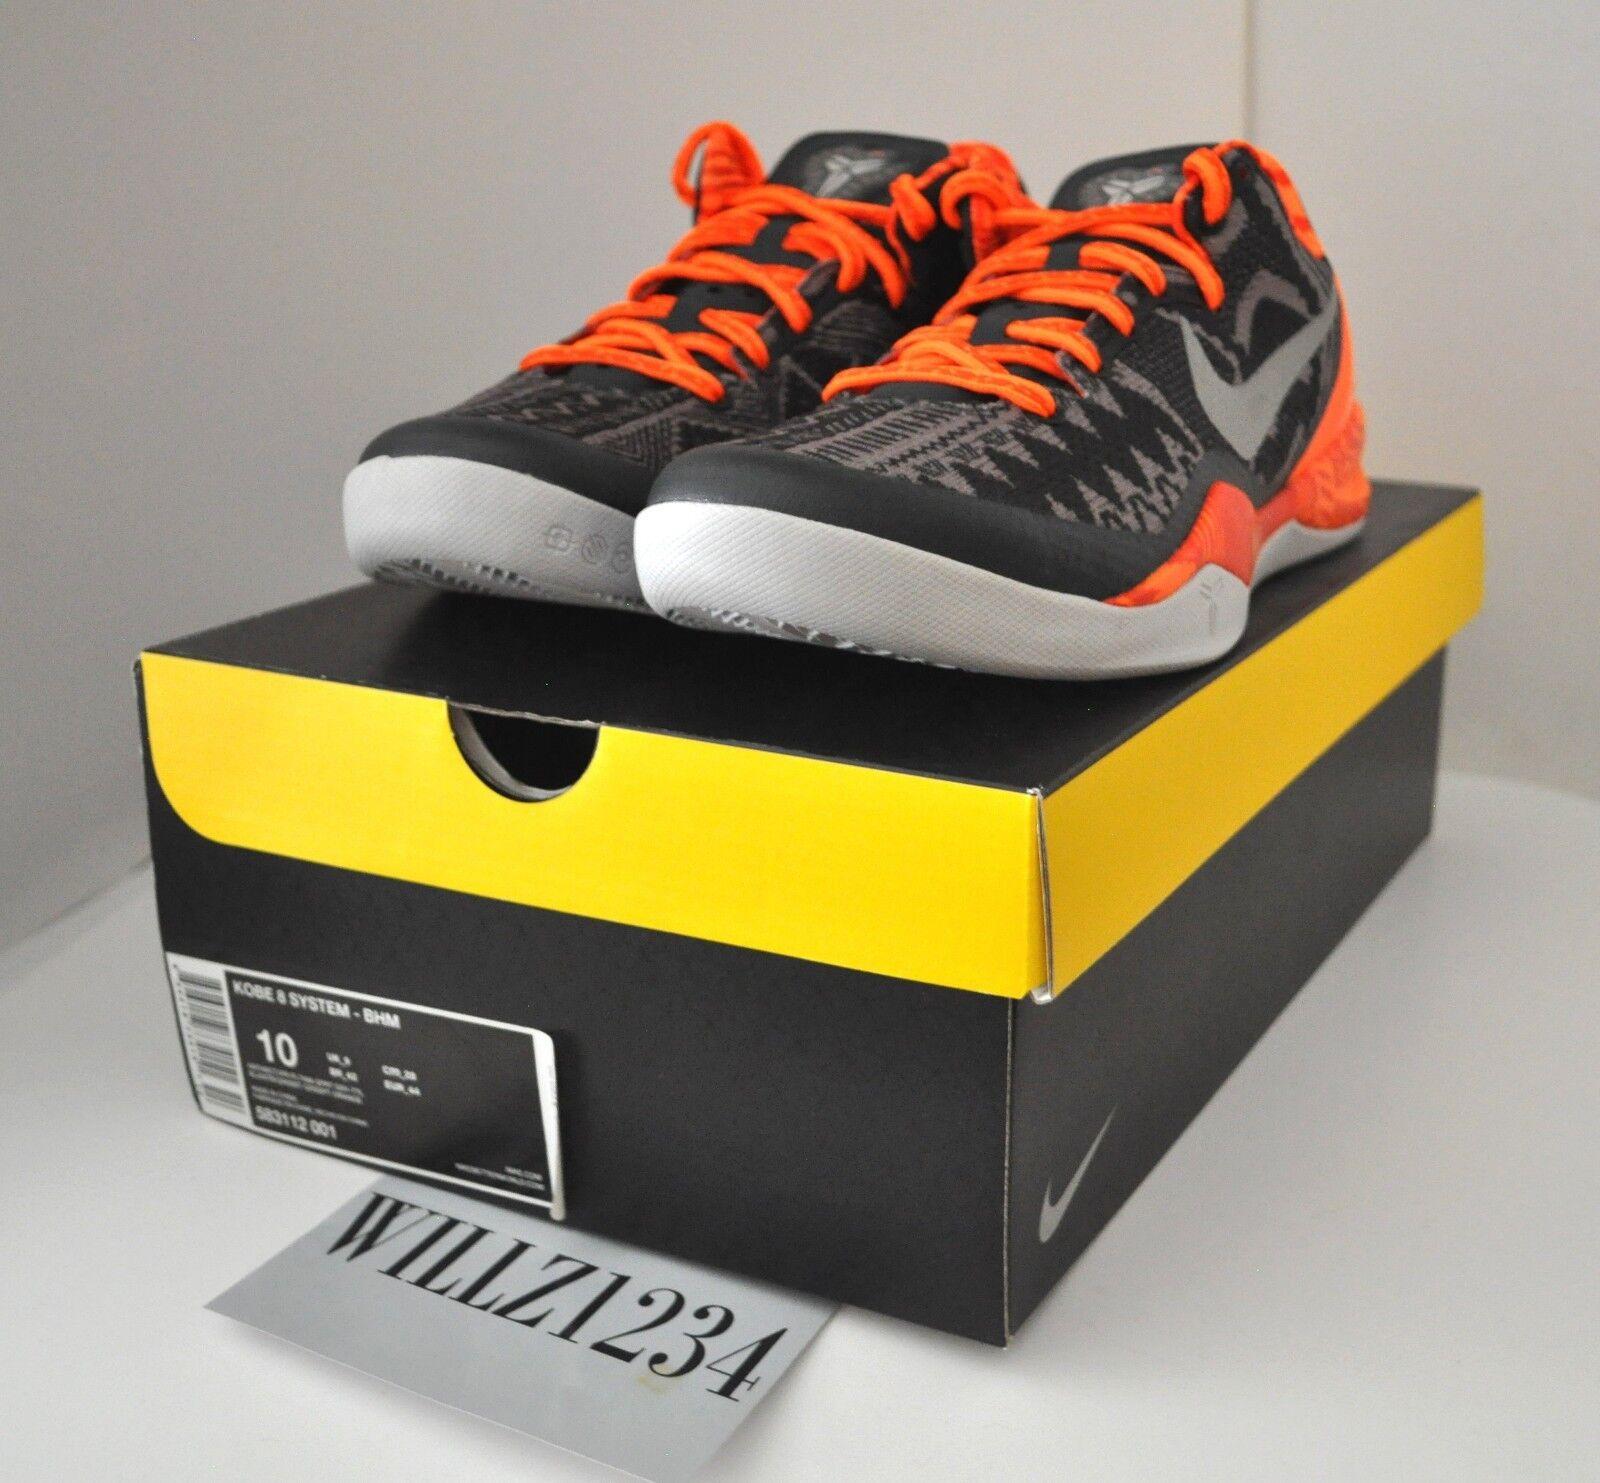 NikeLab NikeLab NikeLab Nike Air Force 1 AF1 Downtown Hi SP x ACRONYM Black Sz 10.5 649941 003 5a5862